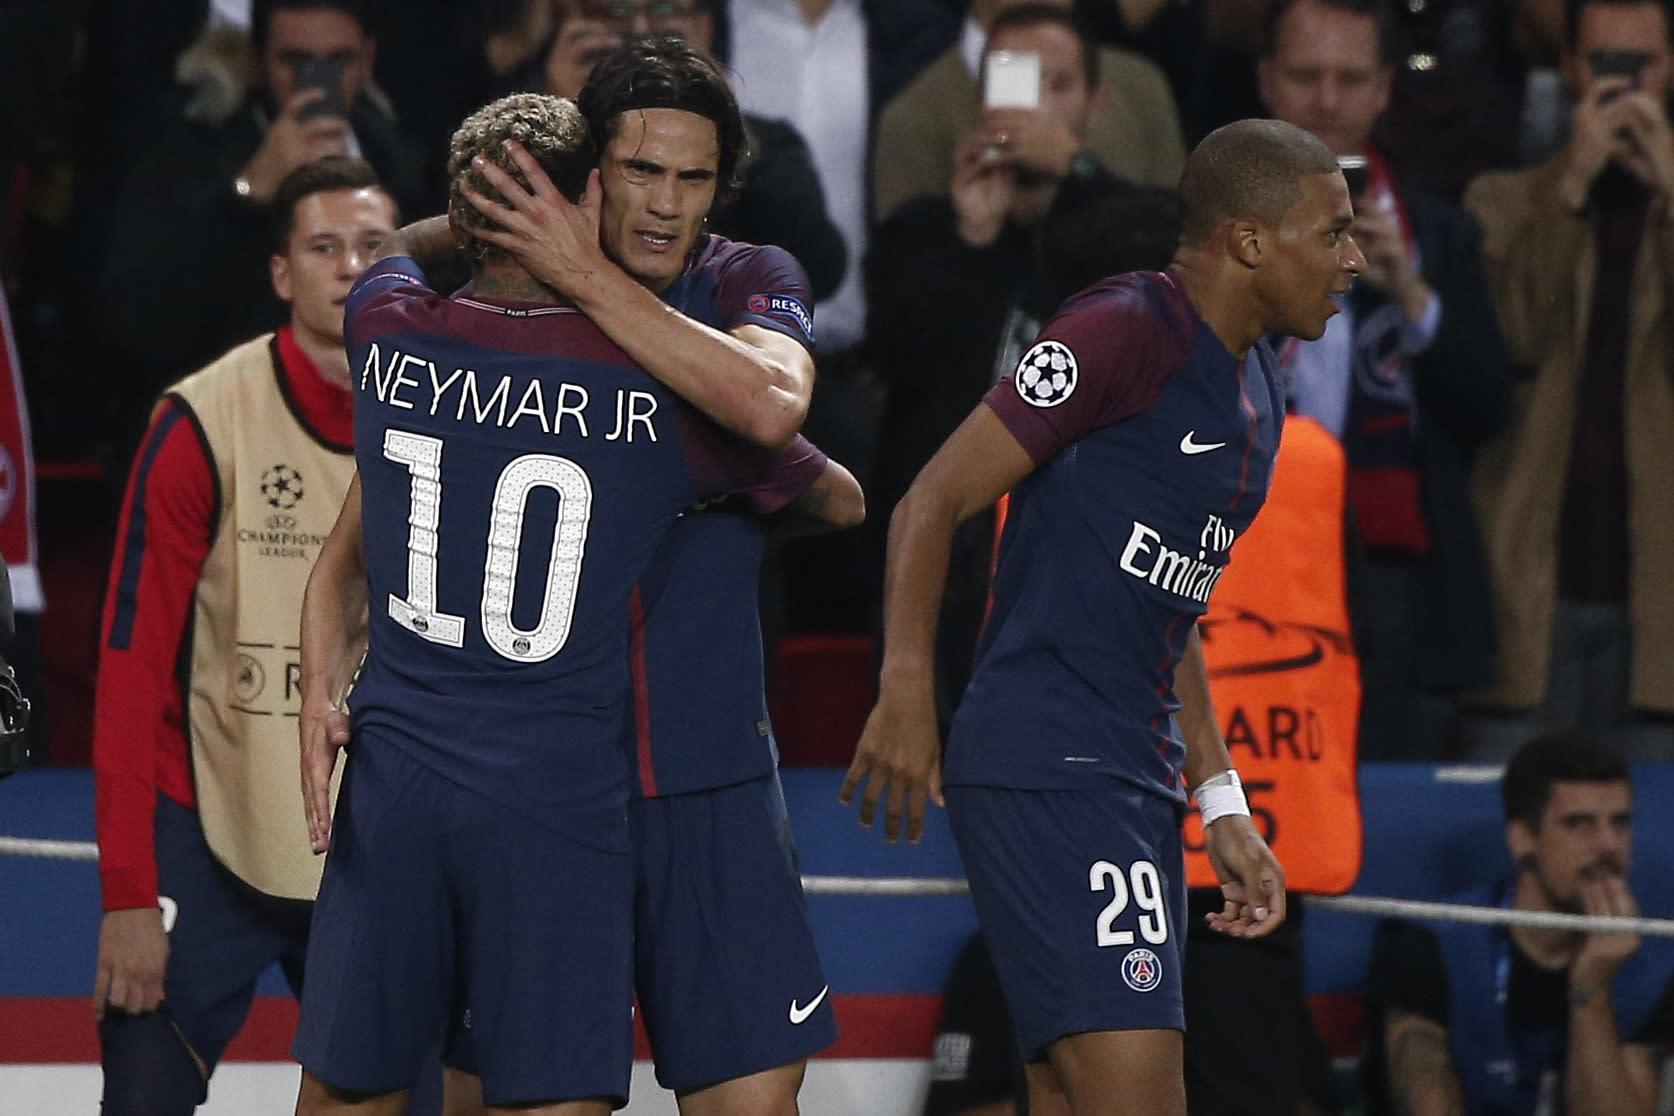 Neymar E Cavani Garantem Vit U00f3ria Do PSG